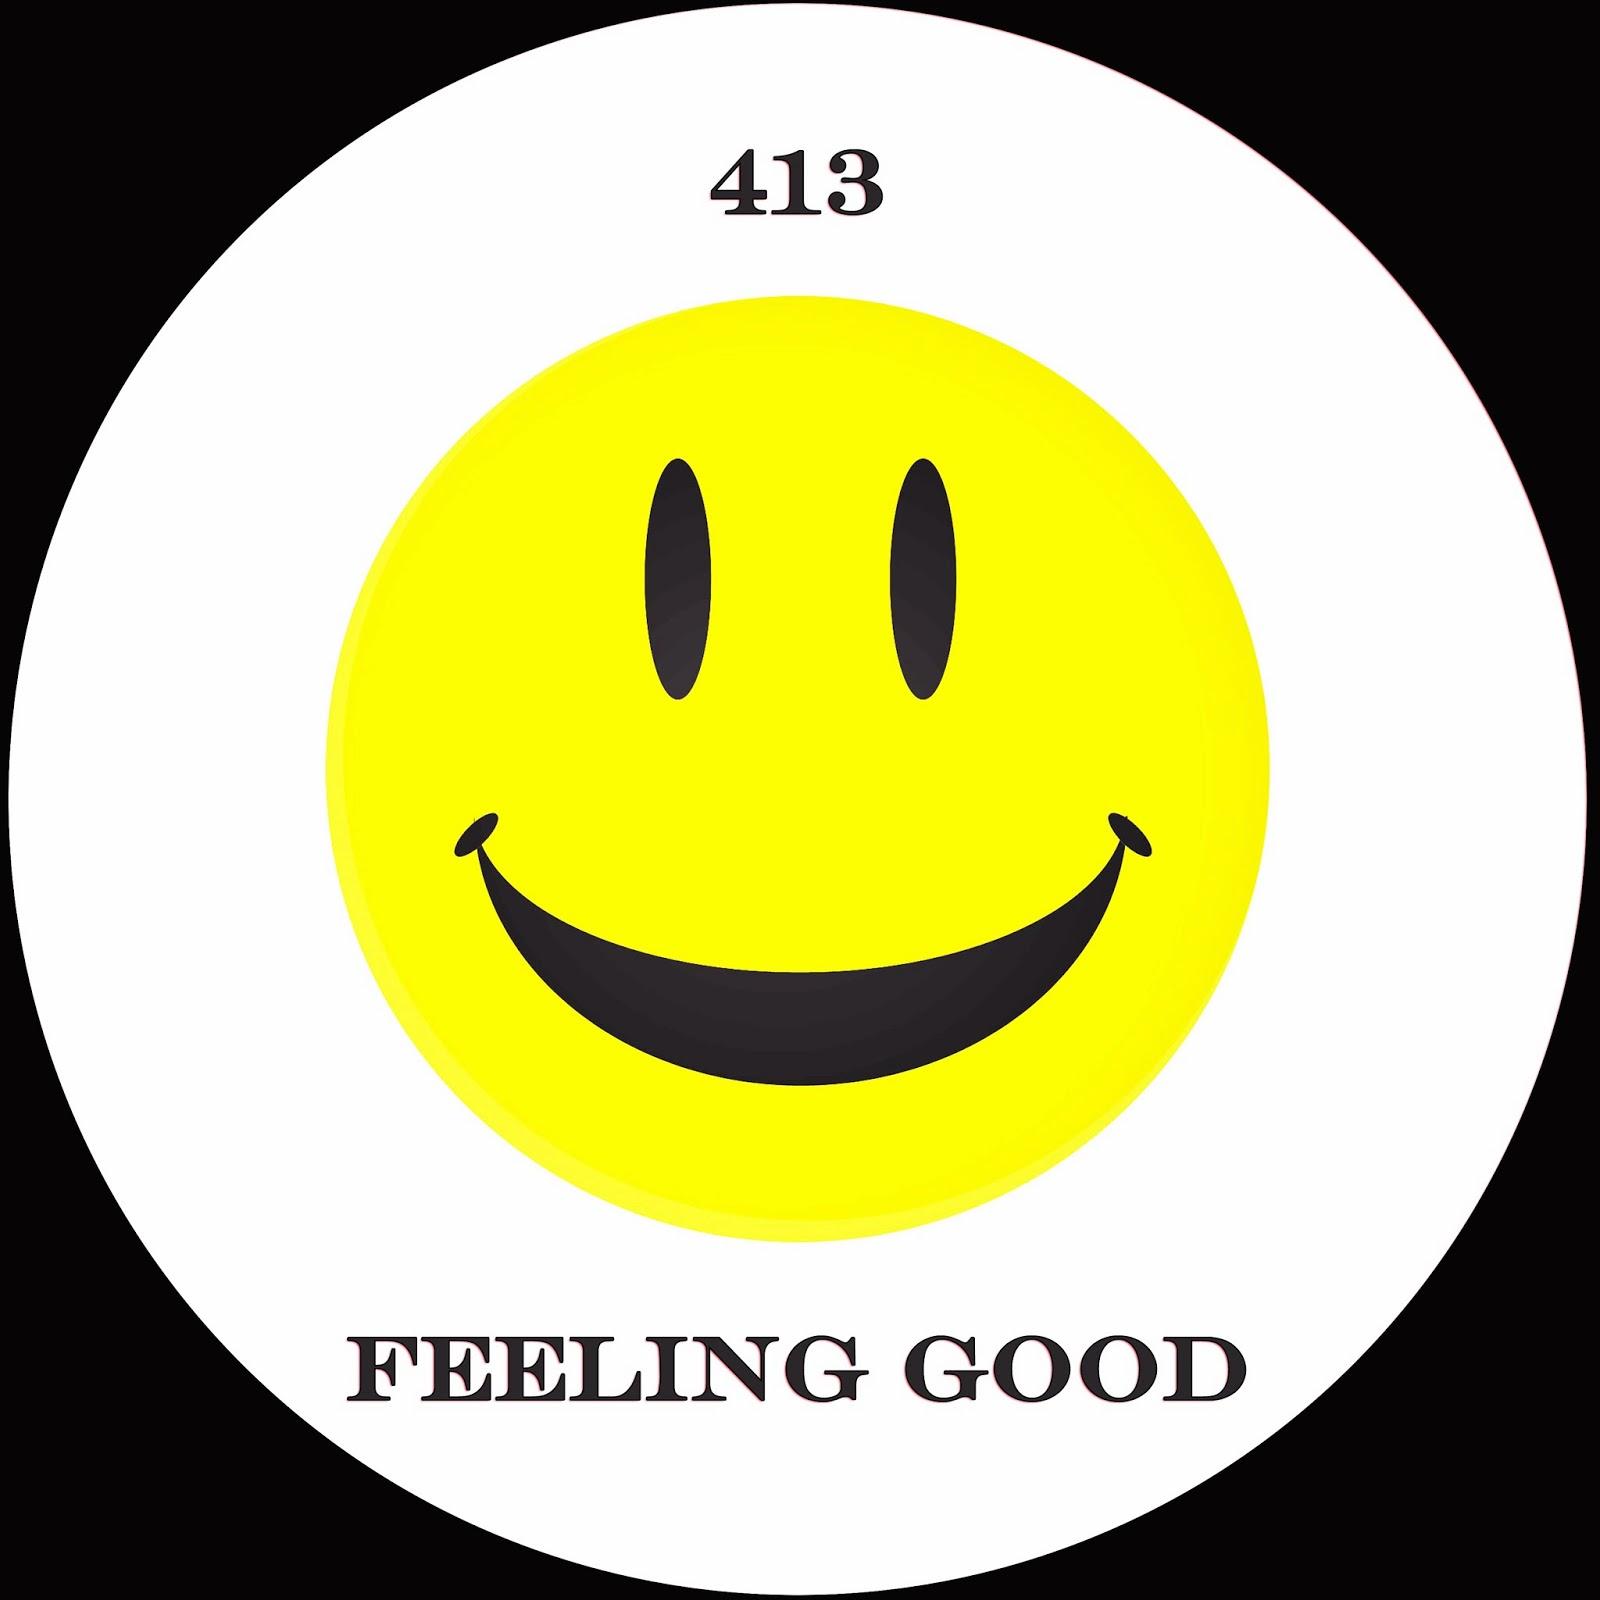 feeling good images - photo #27